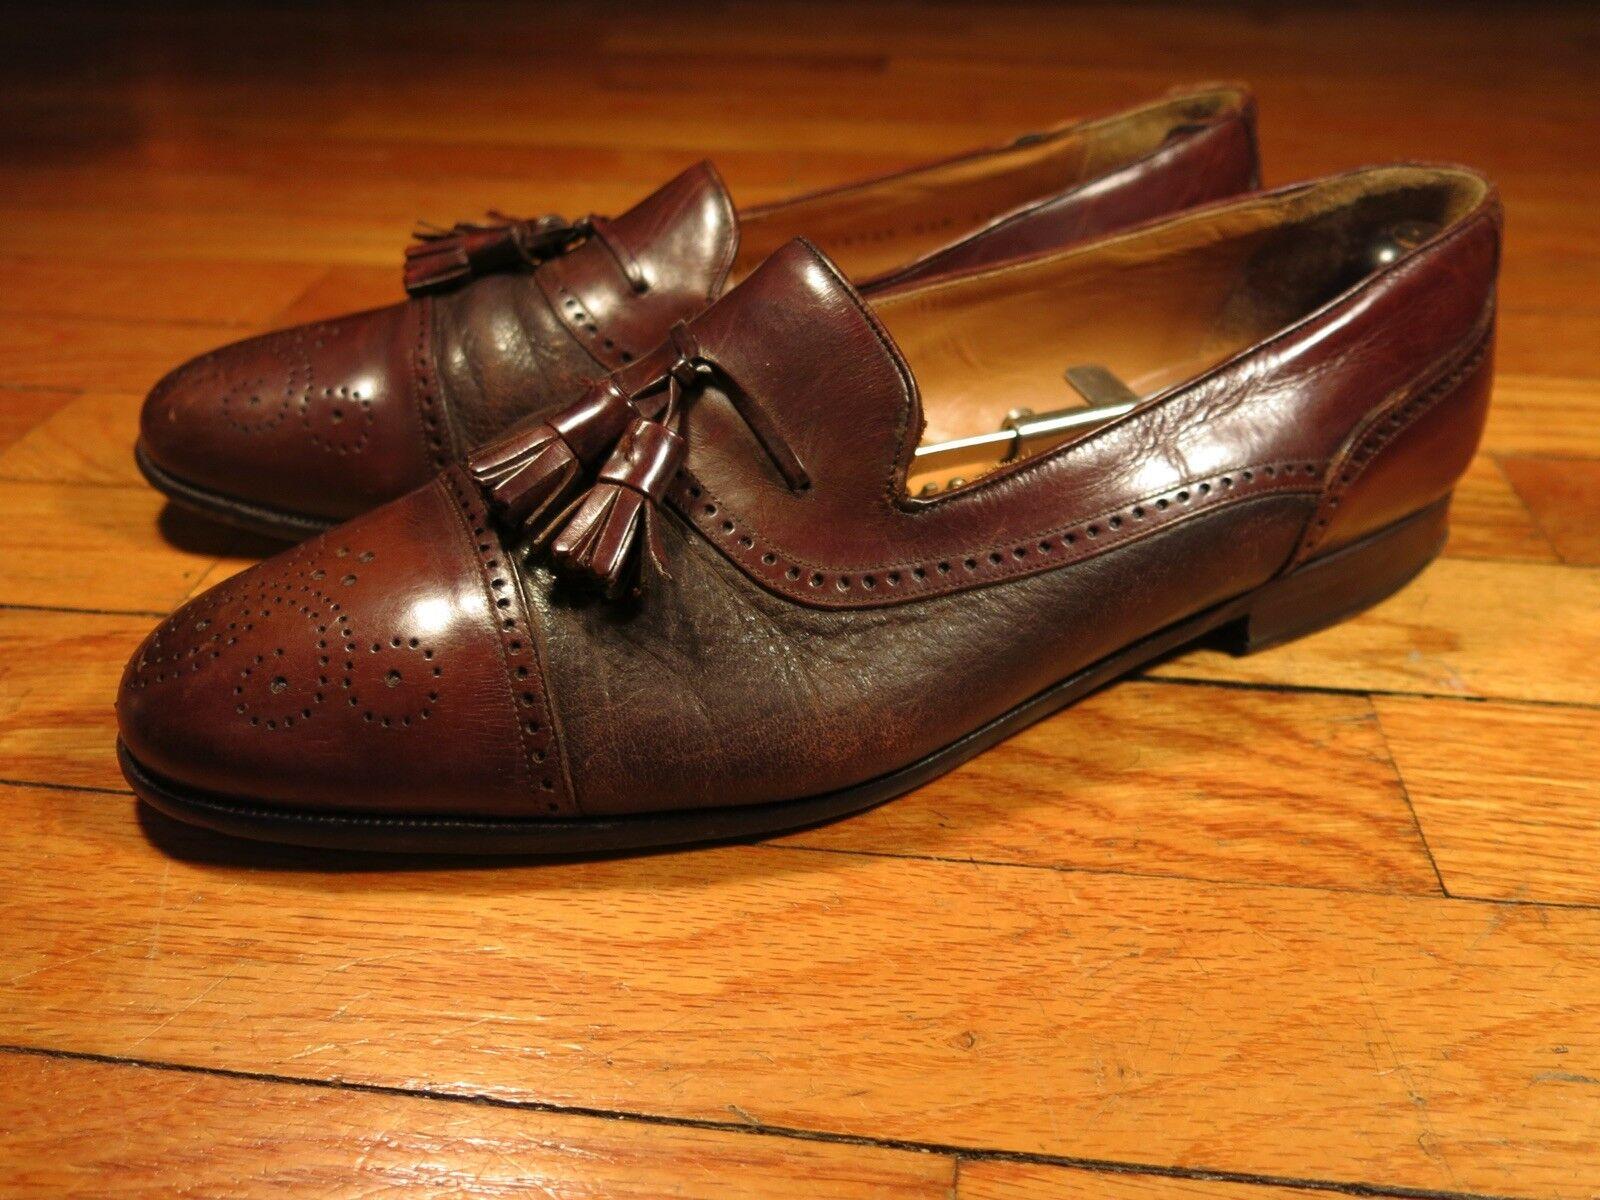 Mens 11 D Mezlan Havana Brogued Cap Cap Cap Toe Tassel Loafers braun Leather Spain 0e108b